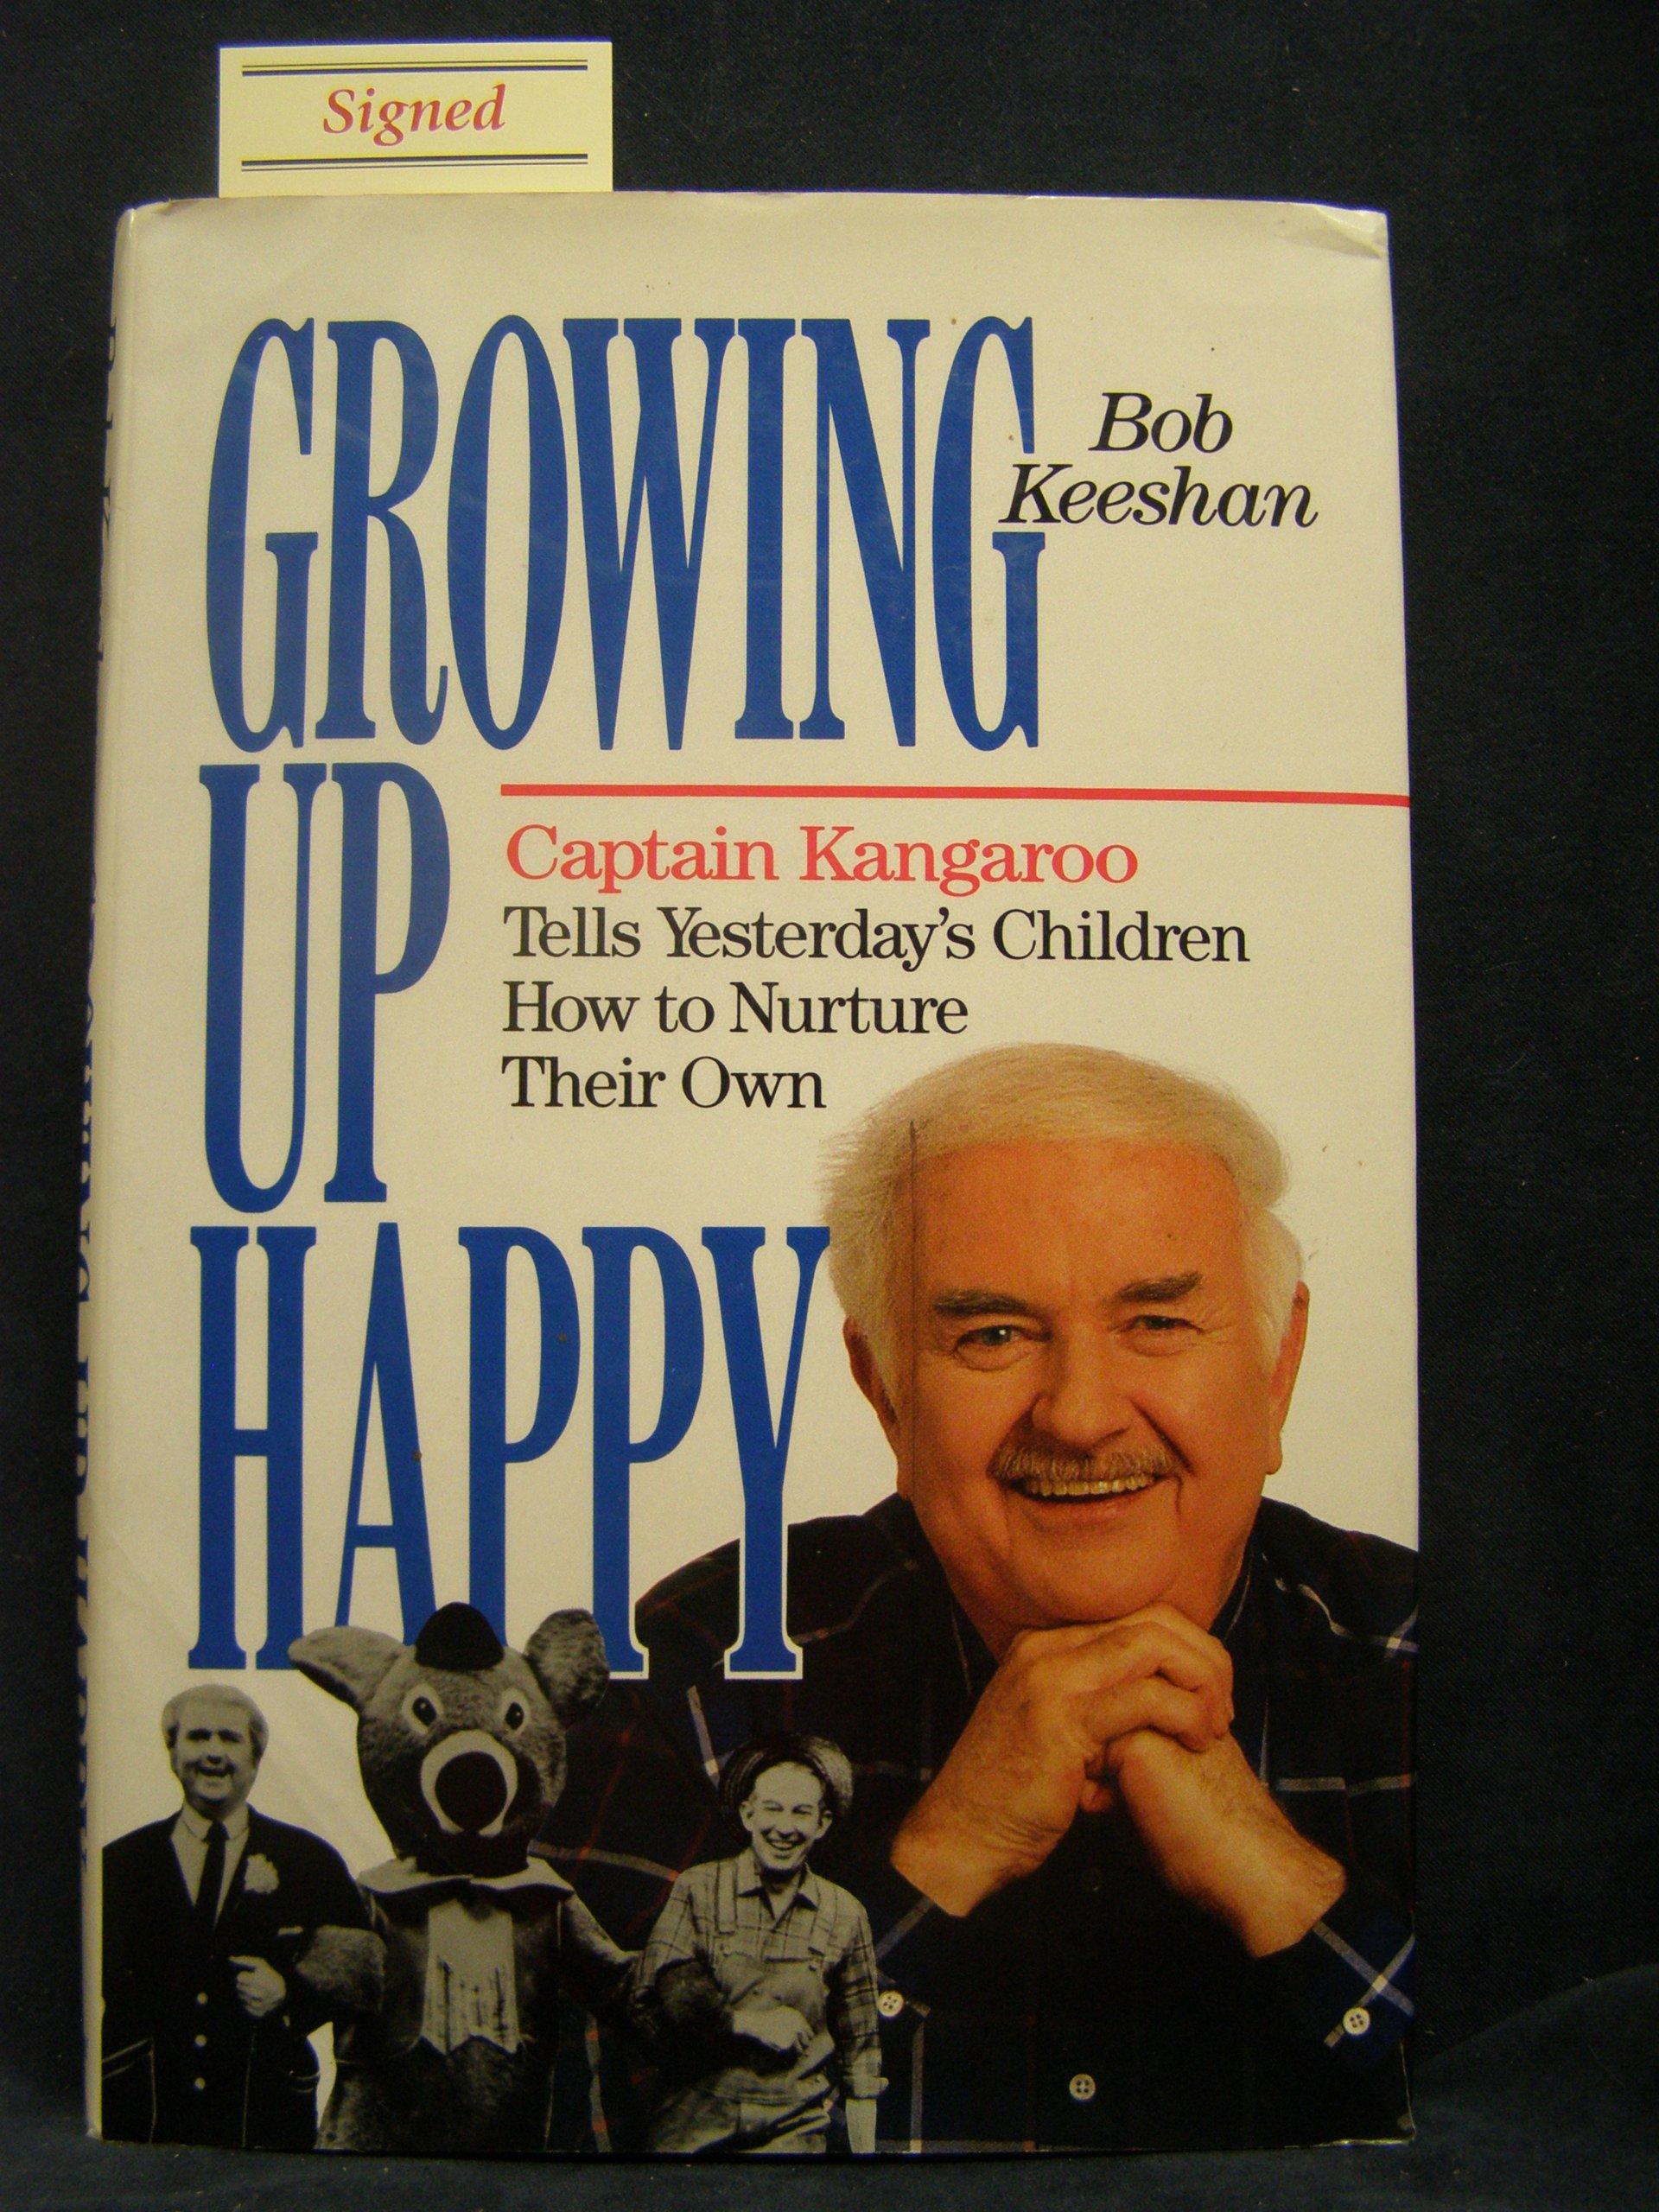 Growing Up Happy: Captain Kangaroo Tells Yesterday's Children How to Nurture Their Own PDF